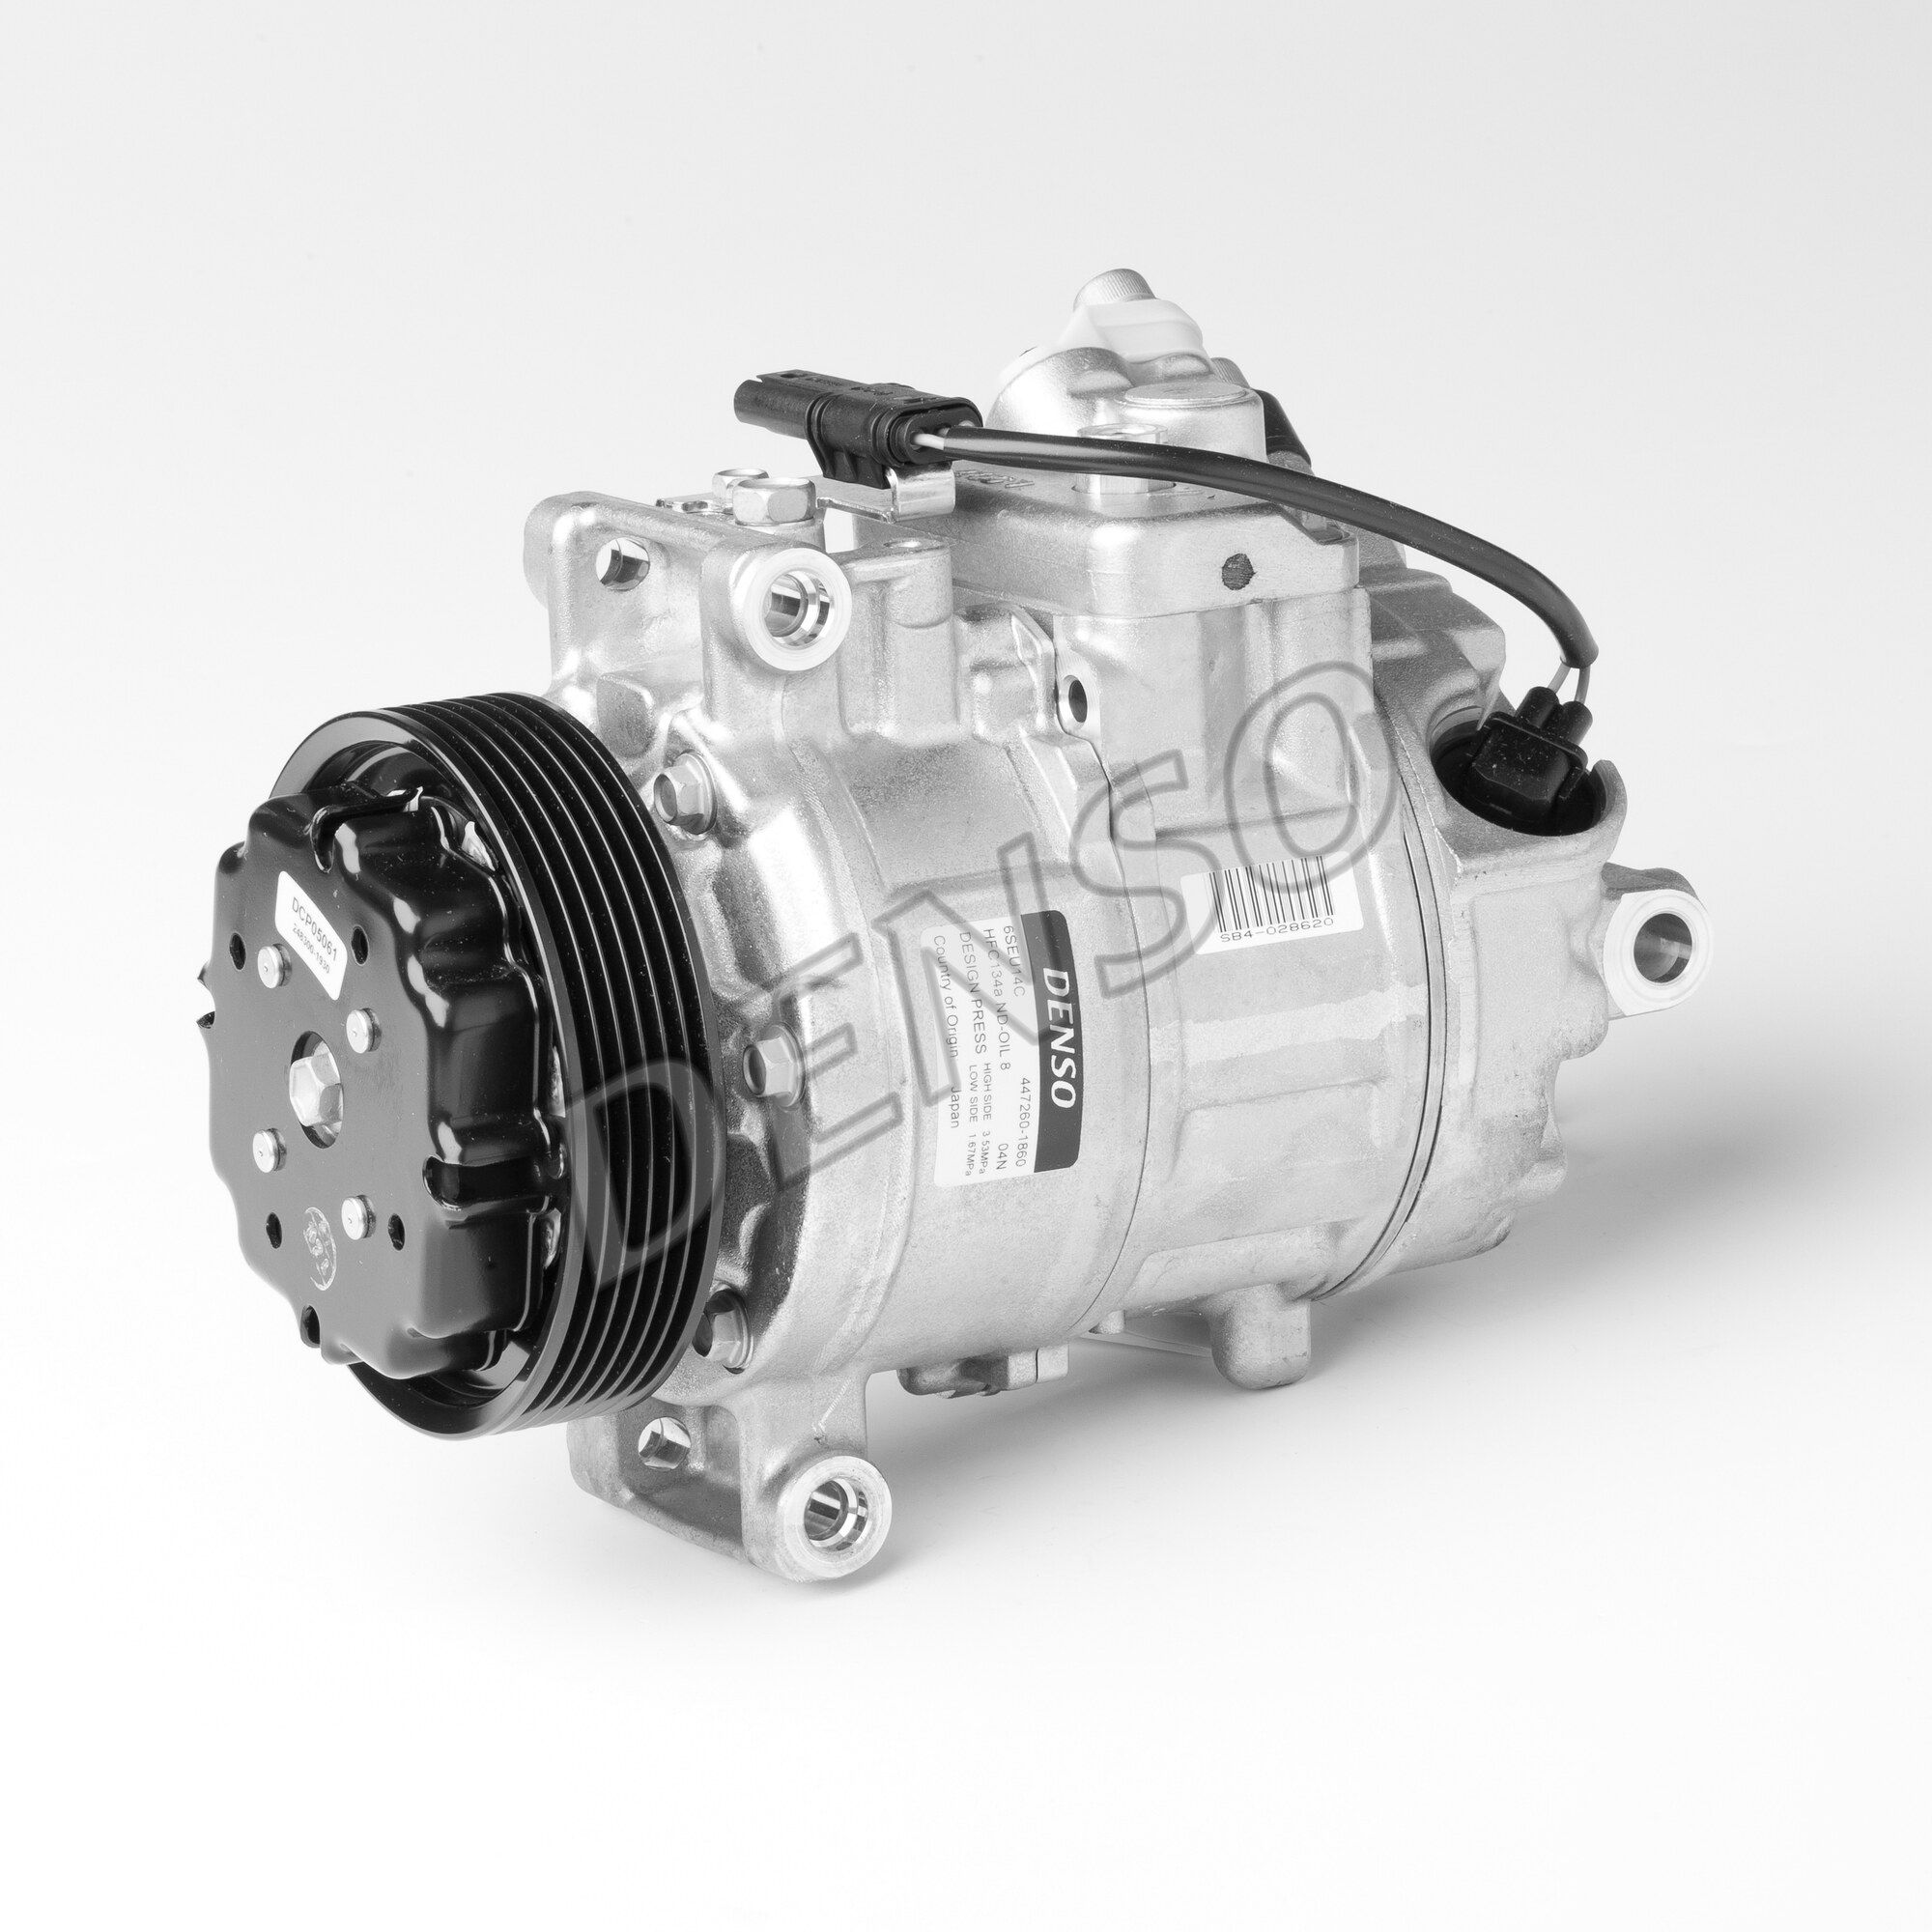 Klimakompressor DENSO DCP05061